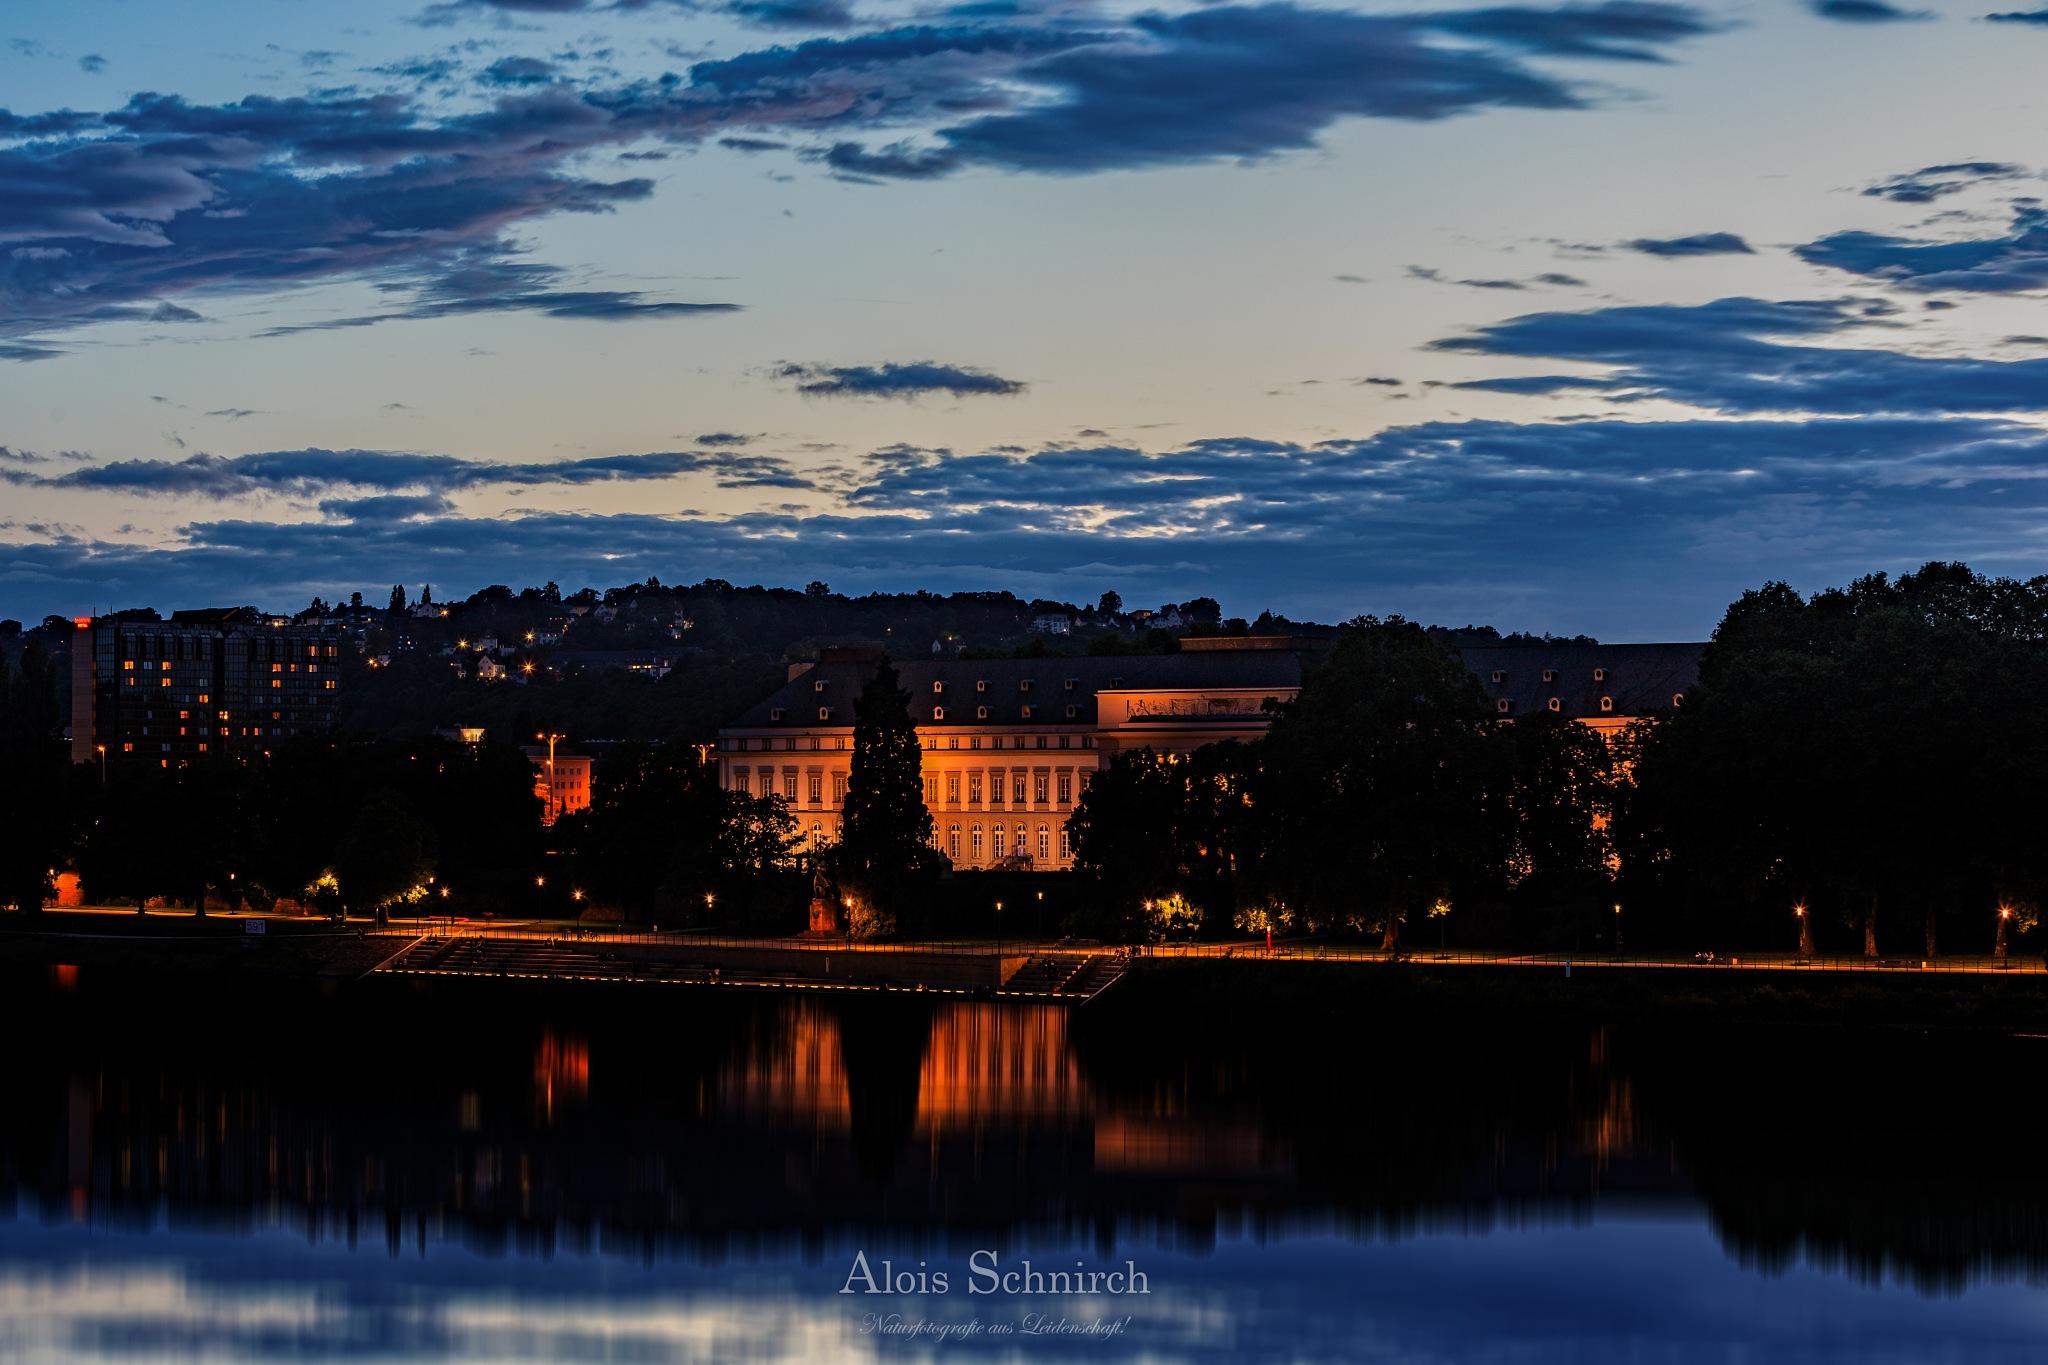 Koblenz at Evening! by Alois Schnirch